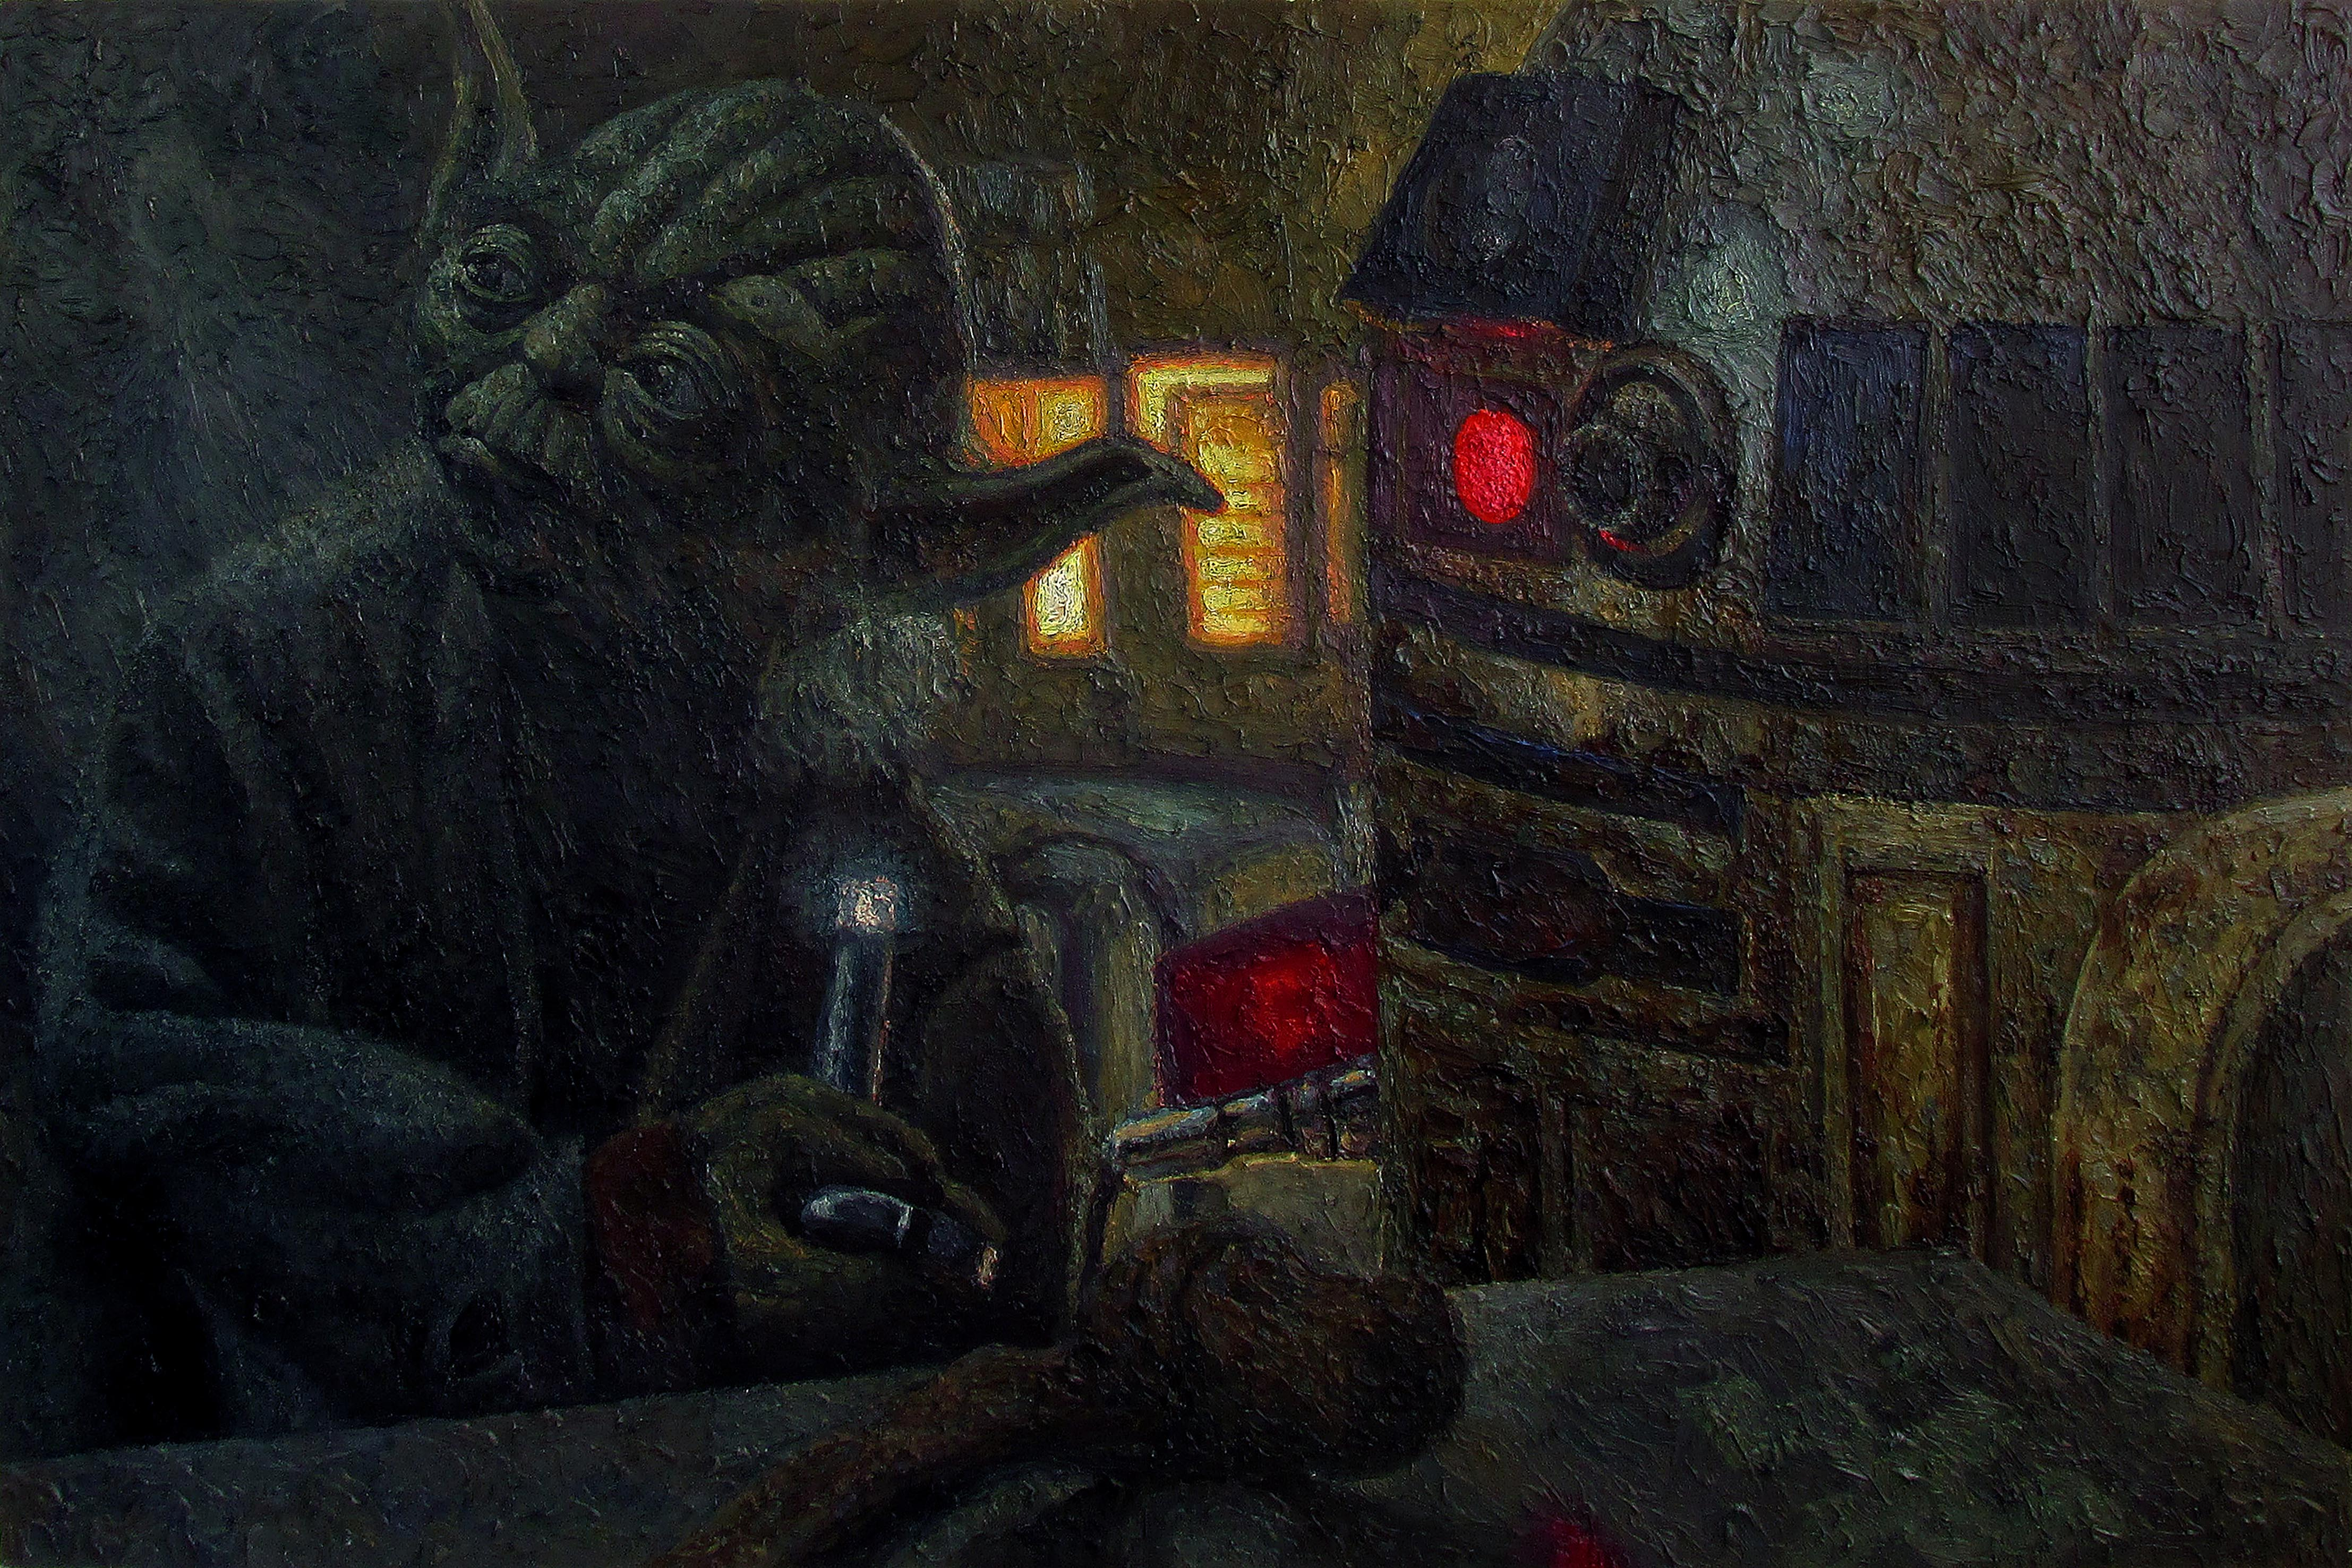 yoda empire strikes back by serkan ergun oil painting